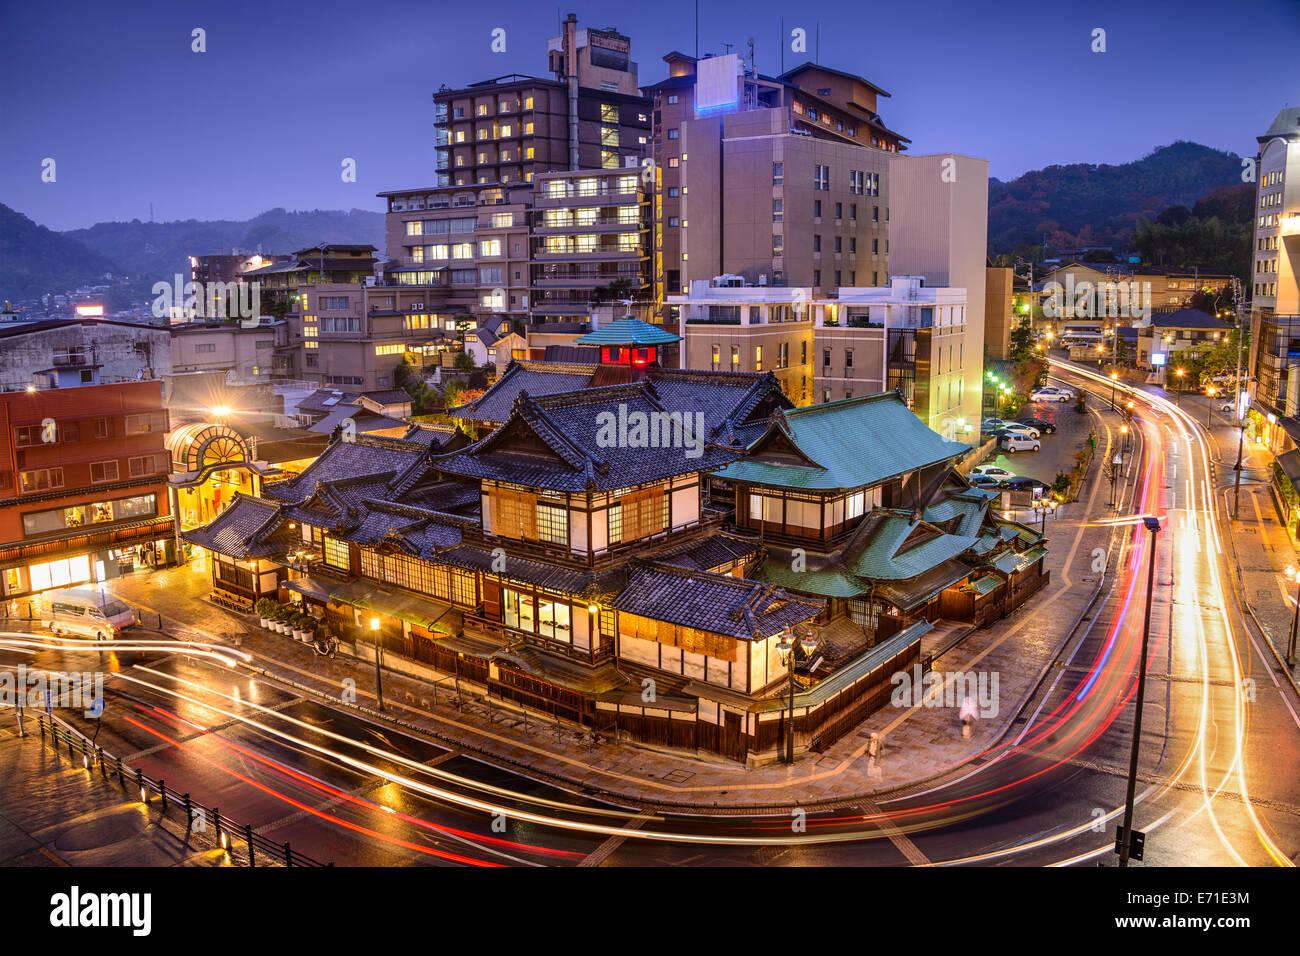 Matsuyama, Giappone skyline del centro a Dogo Onsen bath house. Foto Stock